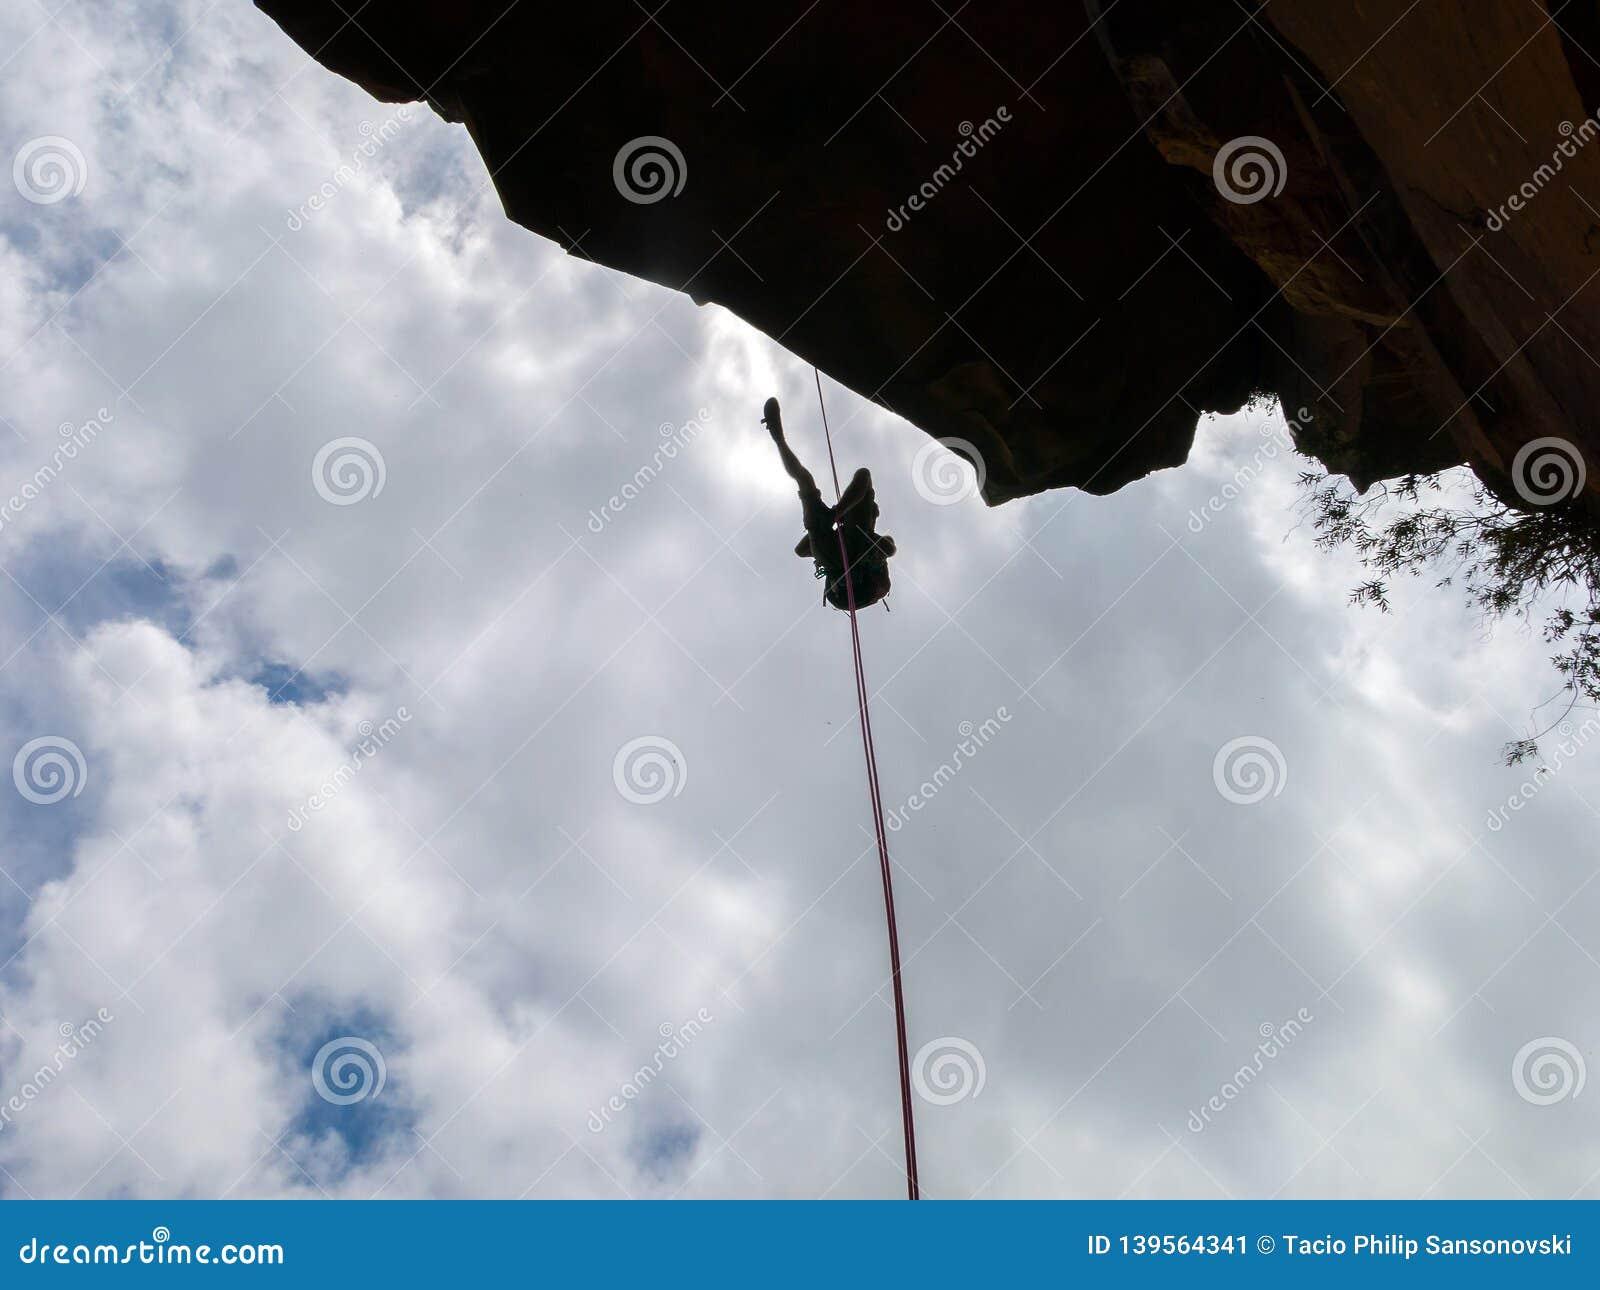 Abseiling ένας αρνητικός τοίχος βράχου sanstone με το μπλε ουρανό στο υπόβαθρο - δείτε από το φυσητήρα